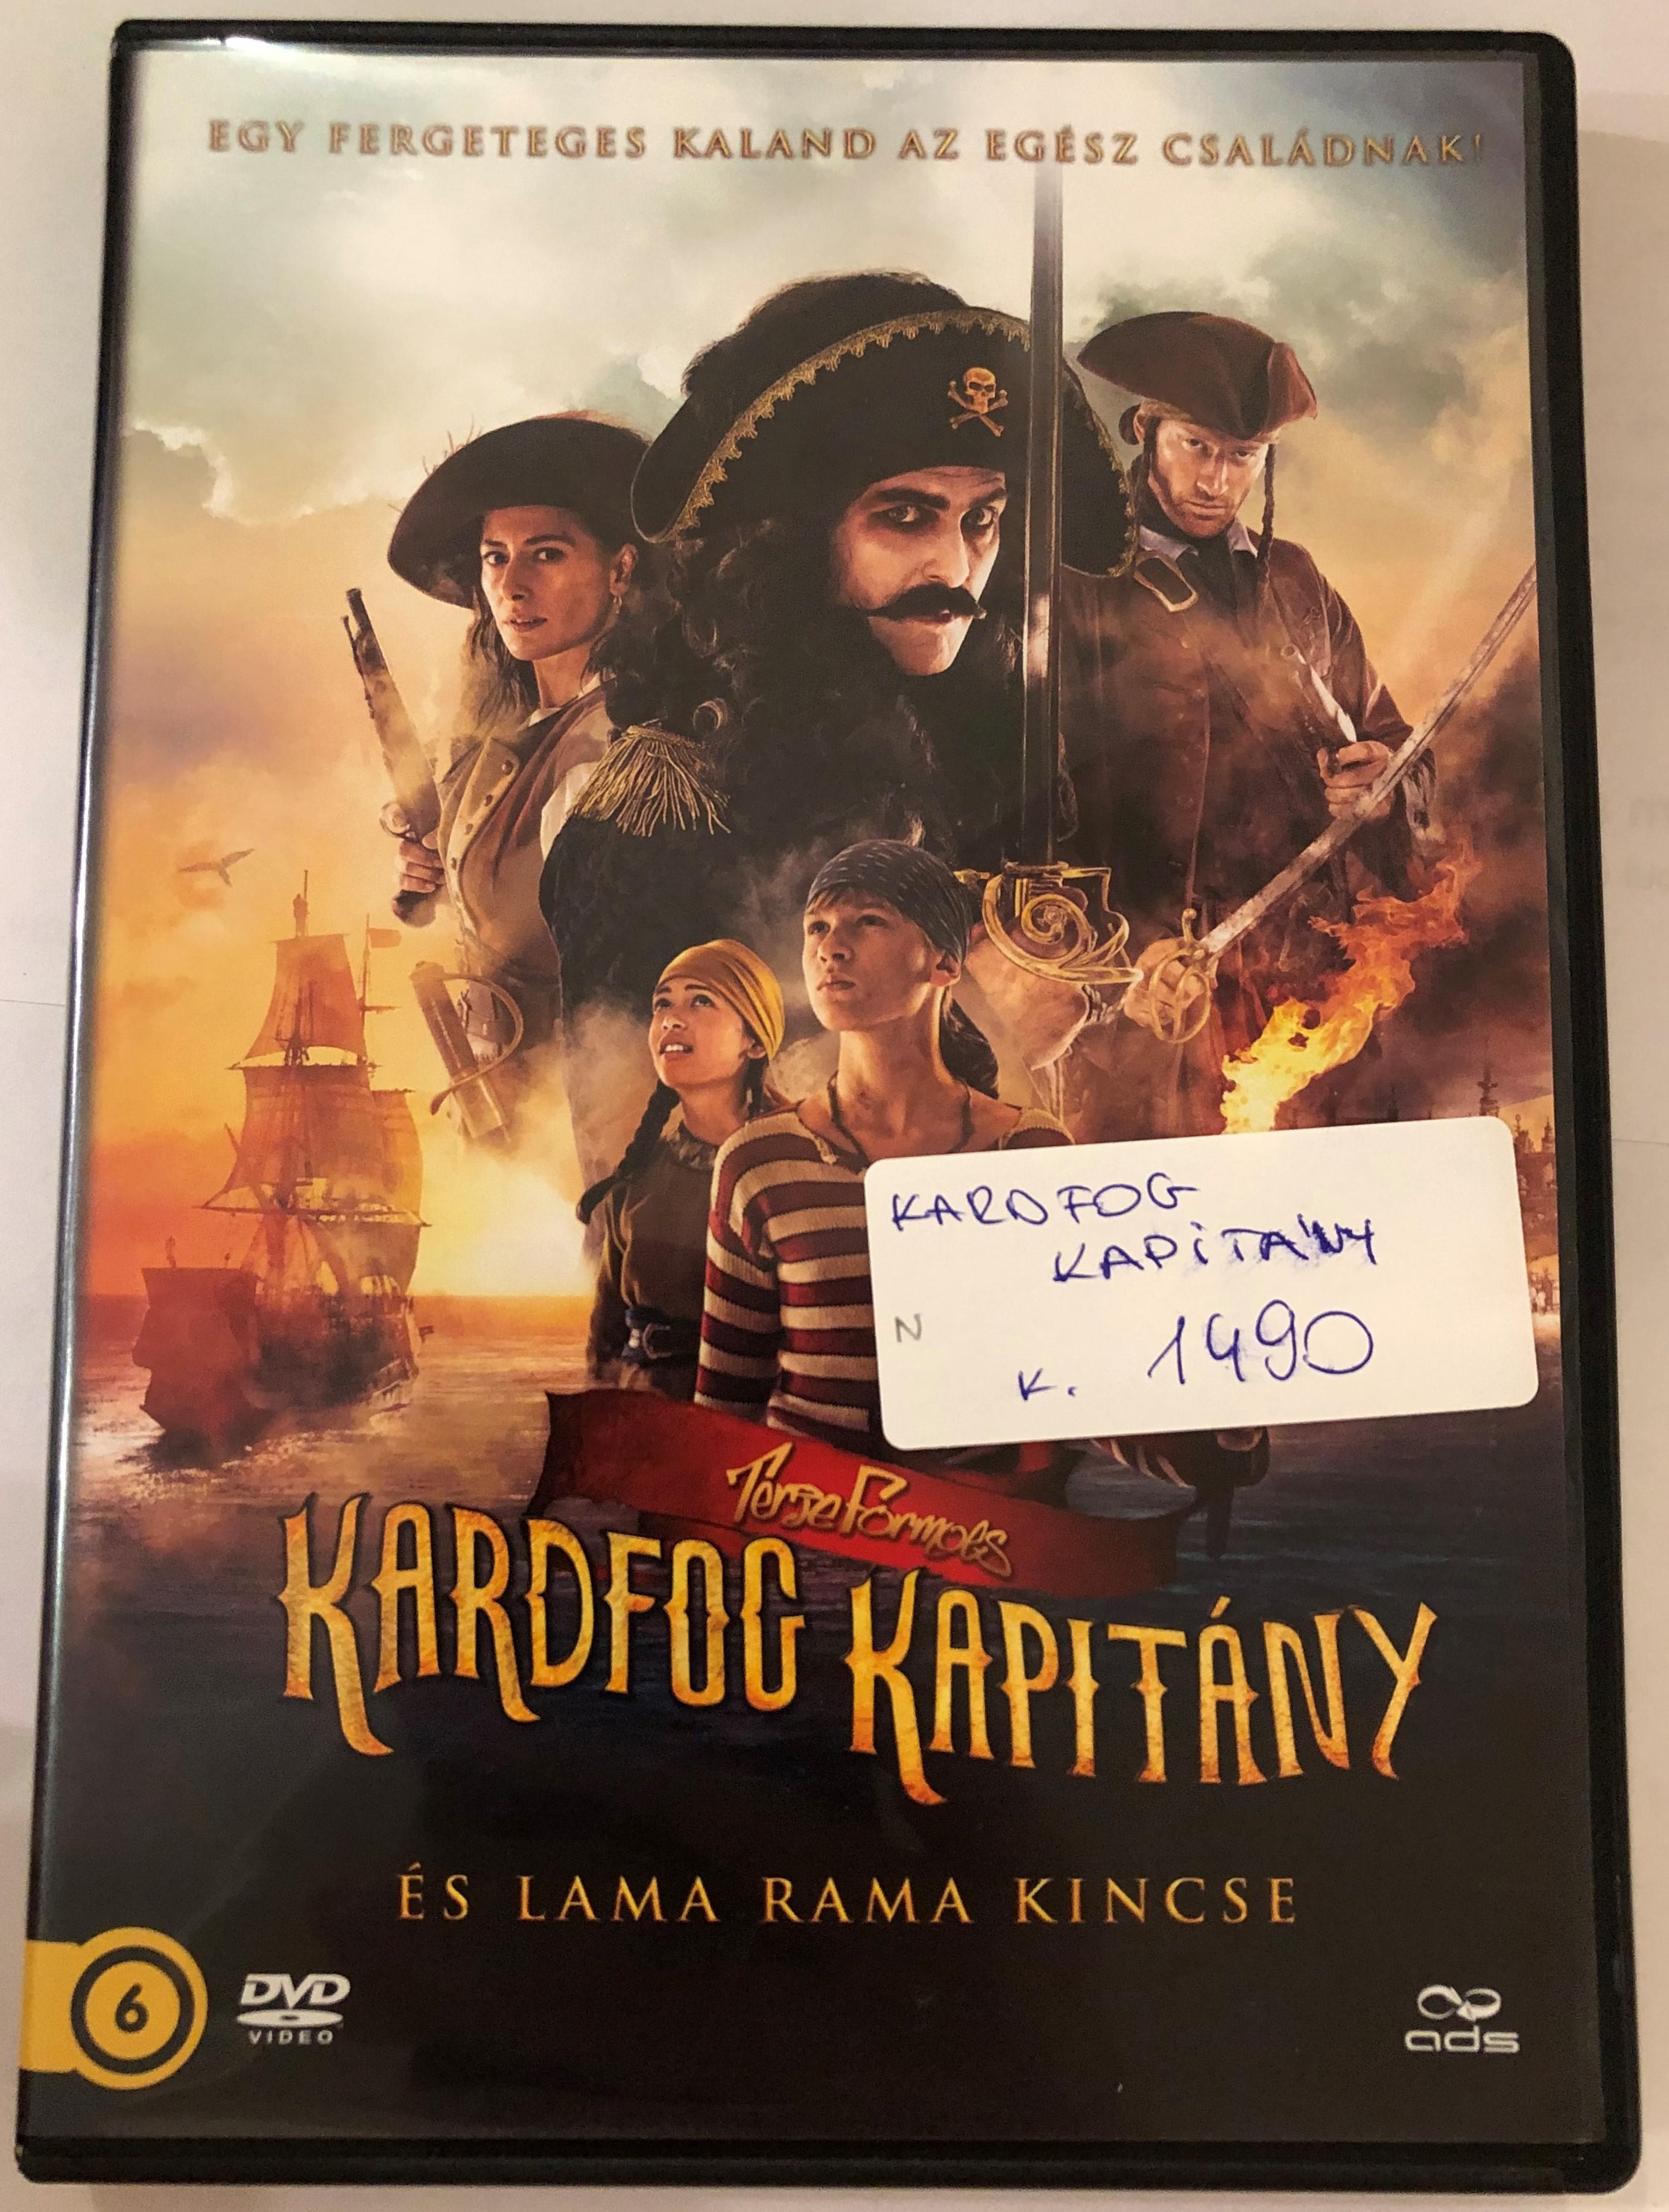 captain-sabertooth-dvd-2014-kaptein-sabeltann-og-skatten-i-lama-rama-kardfog-kapit-ny-s-a-lama-rama-kincse-1-.jpg